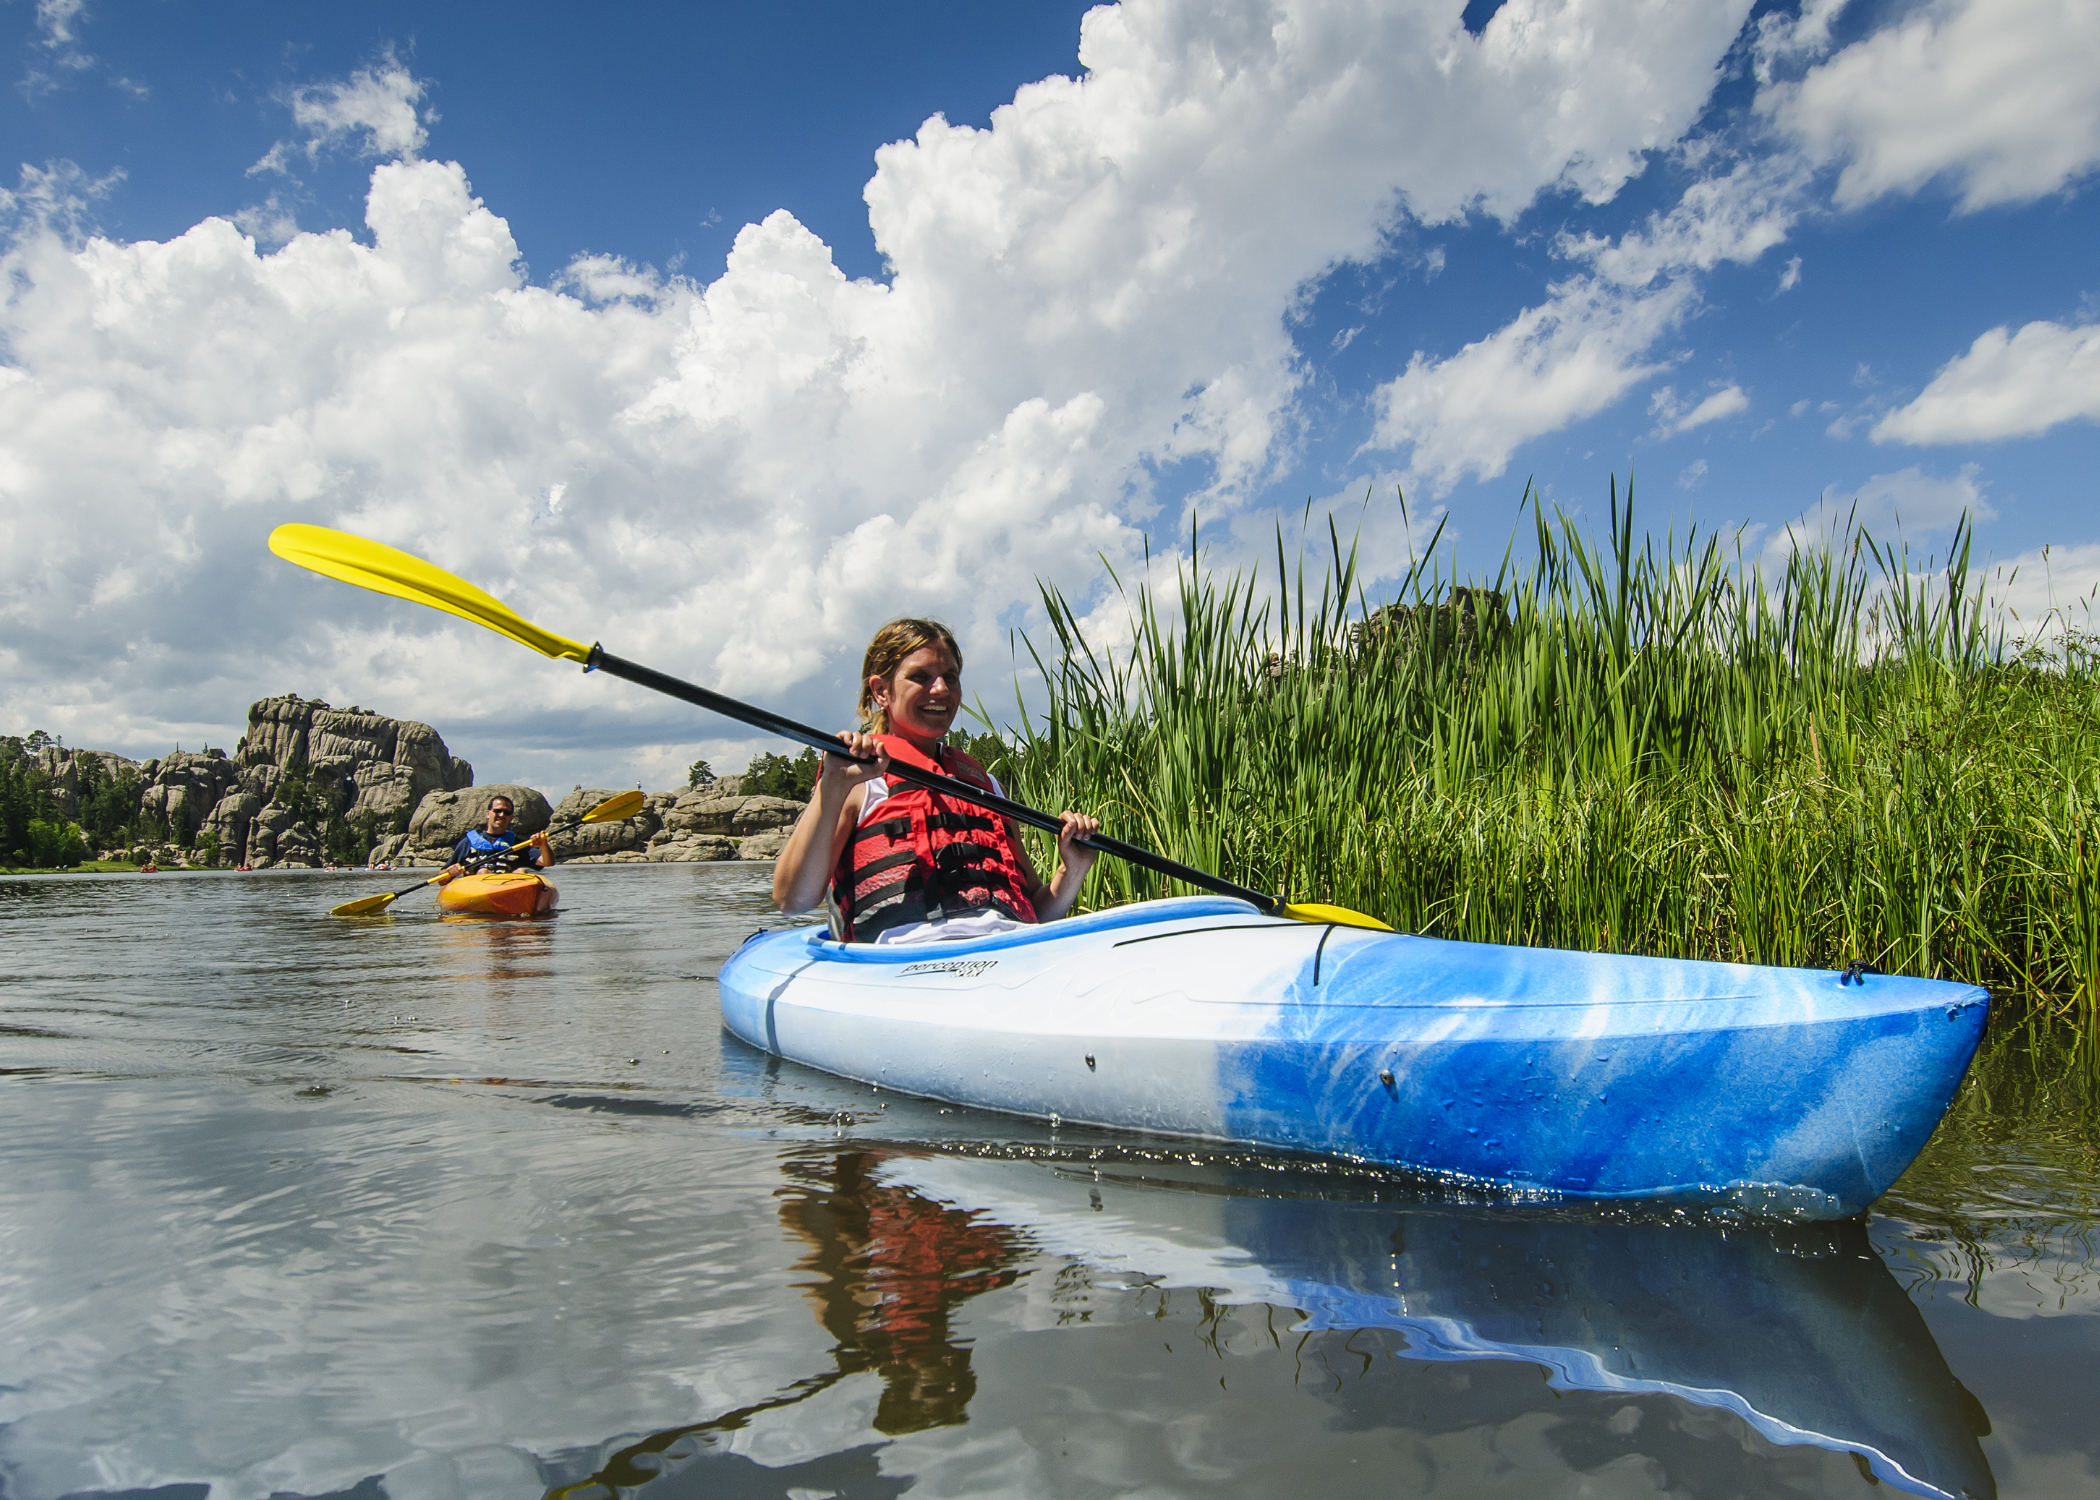 Kayaking at Custer State Park